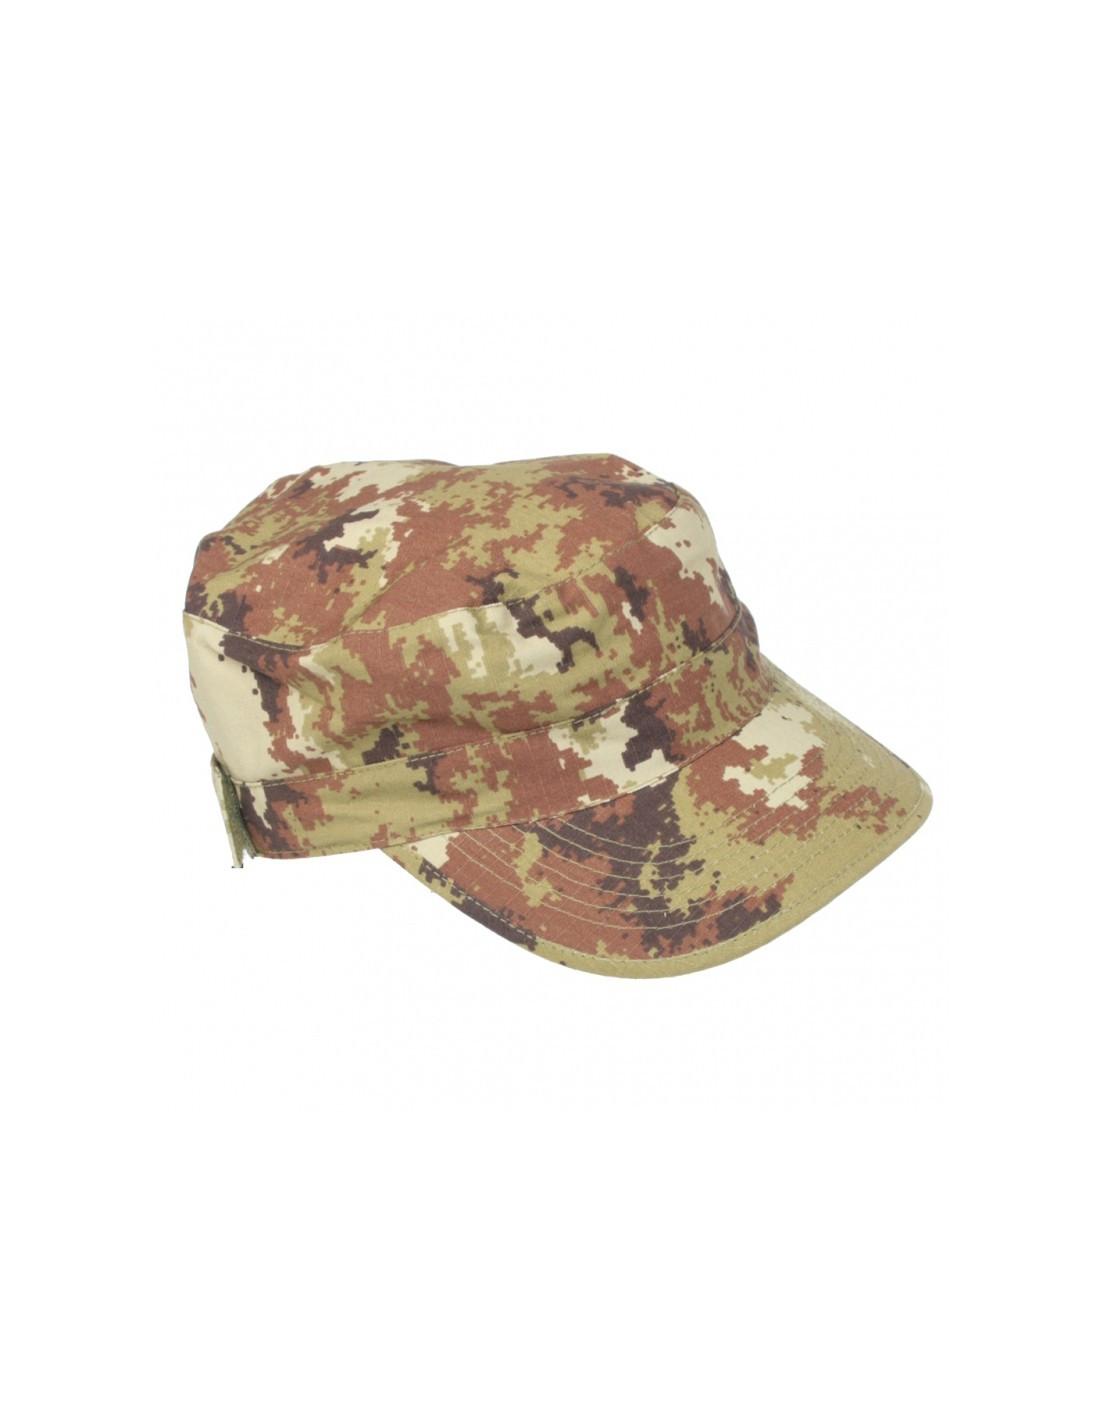 Cappello militare Ranger SBB vegetato con tasca - 0324 - SBB Brancaleoni b240008e73b4